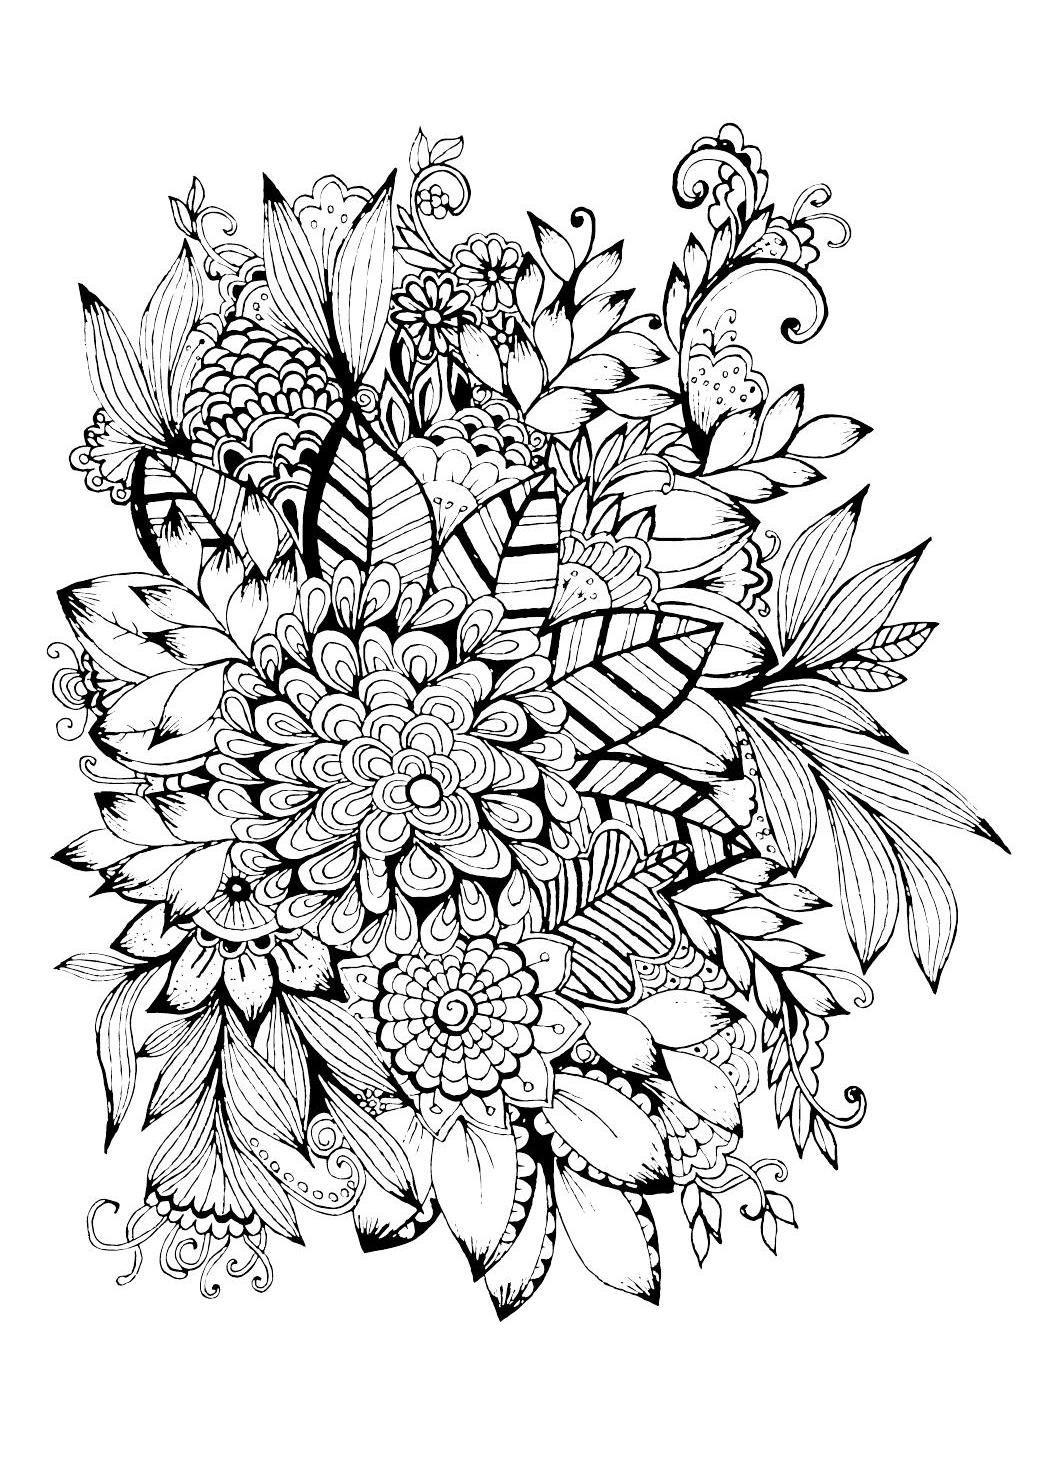 Colour Calm 02 (Sampler) | Zentangle drawings, Free ...